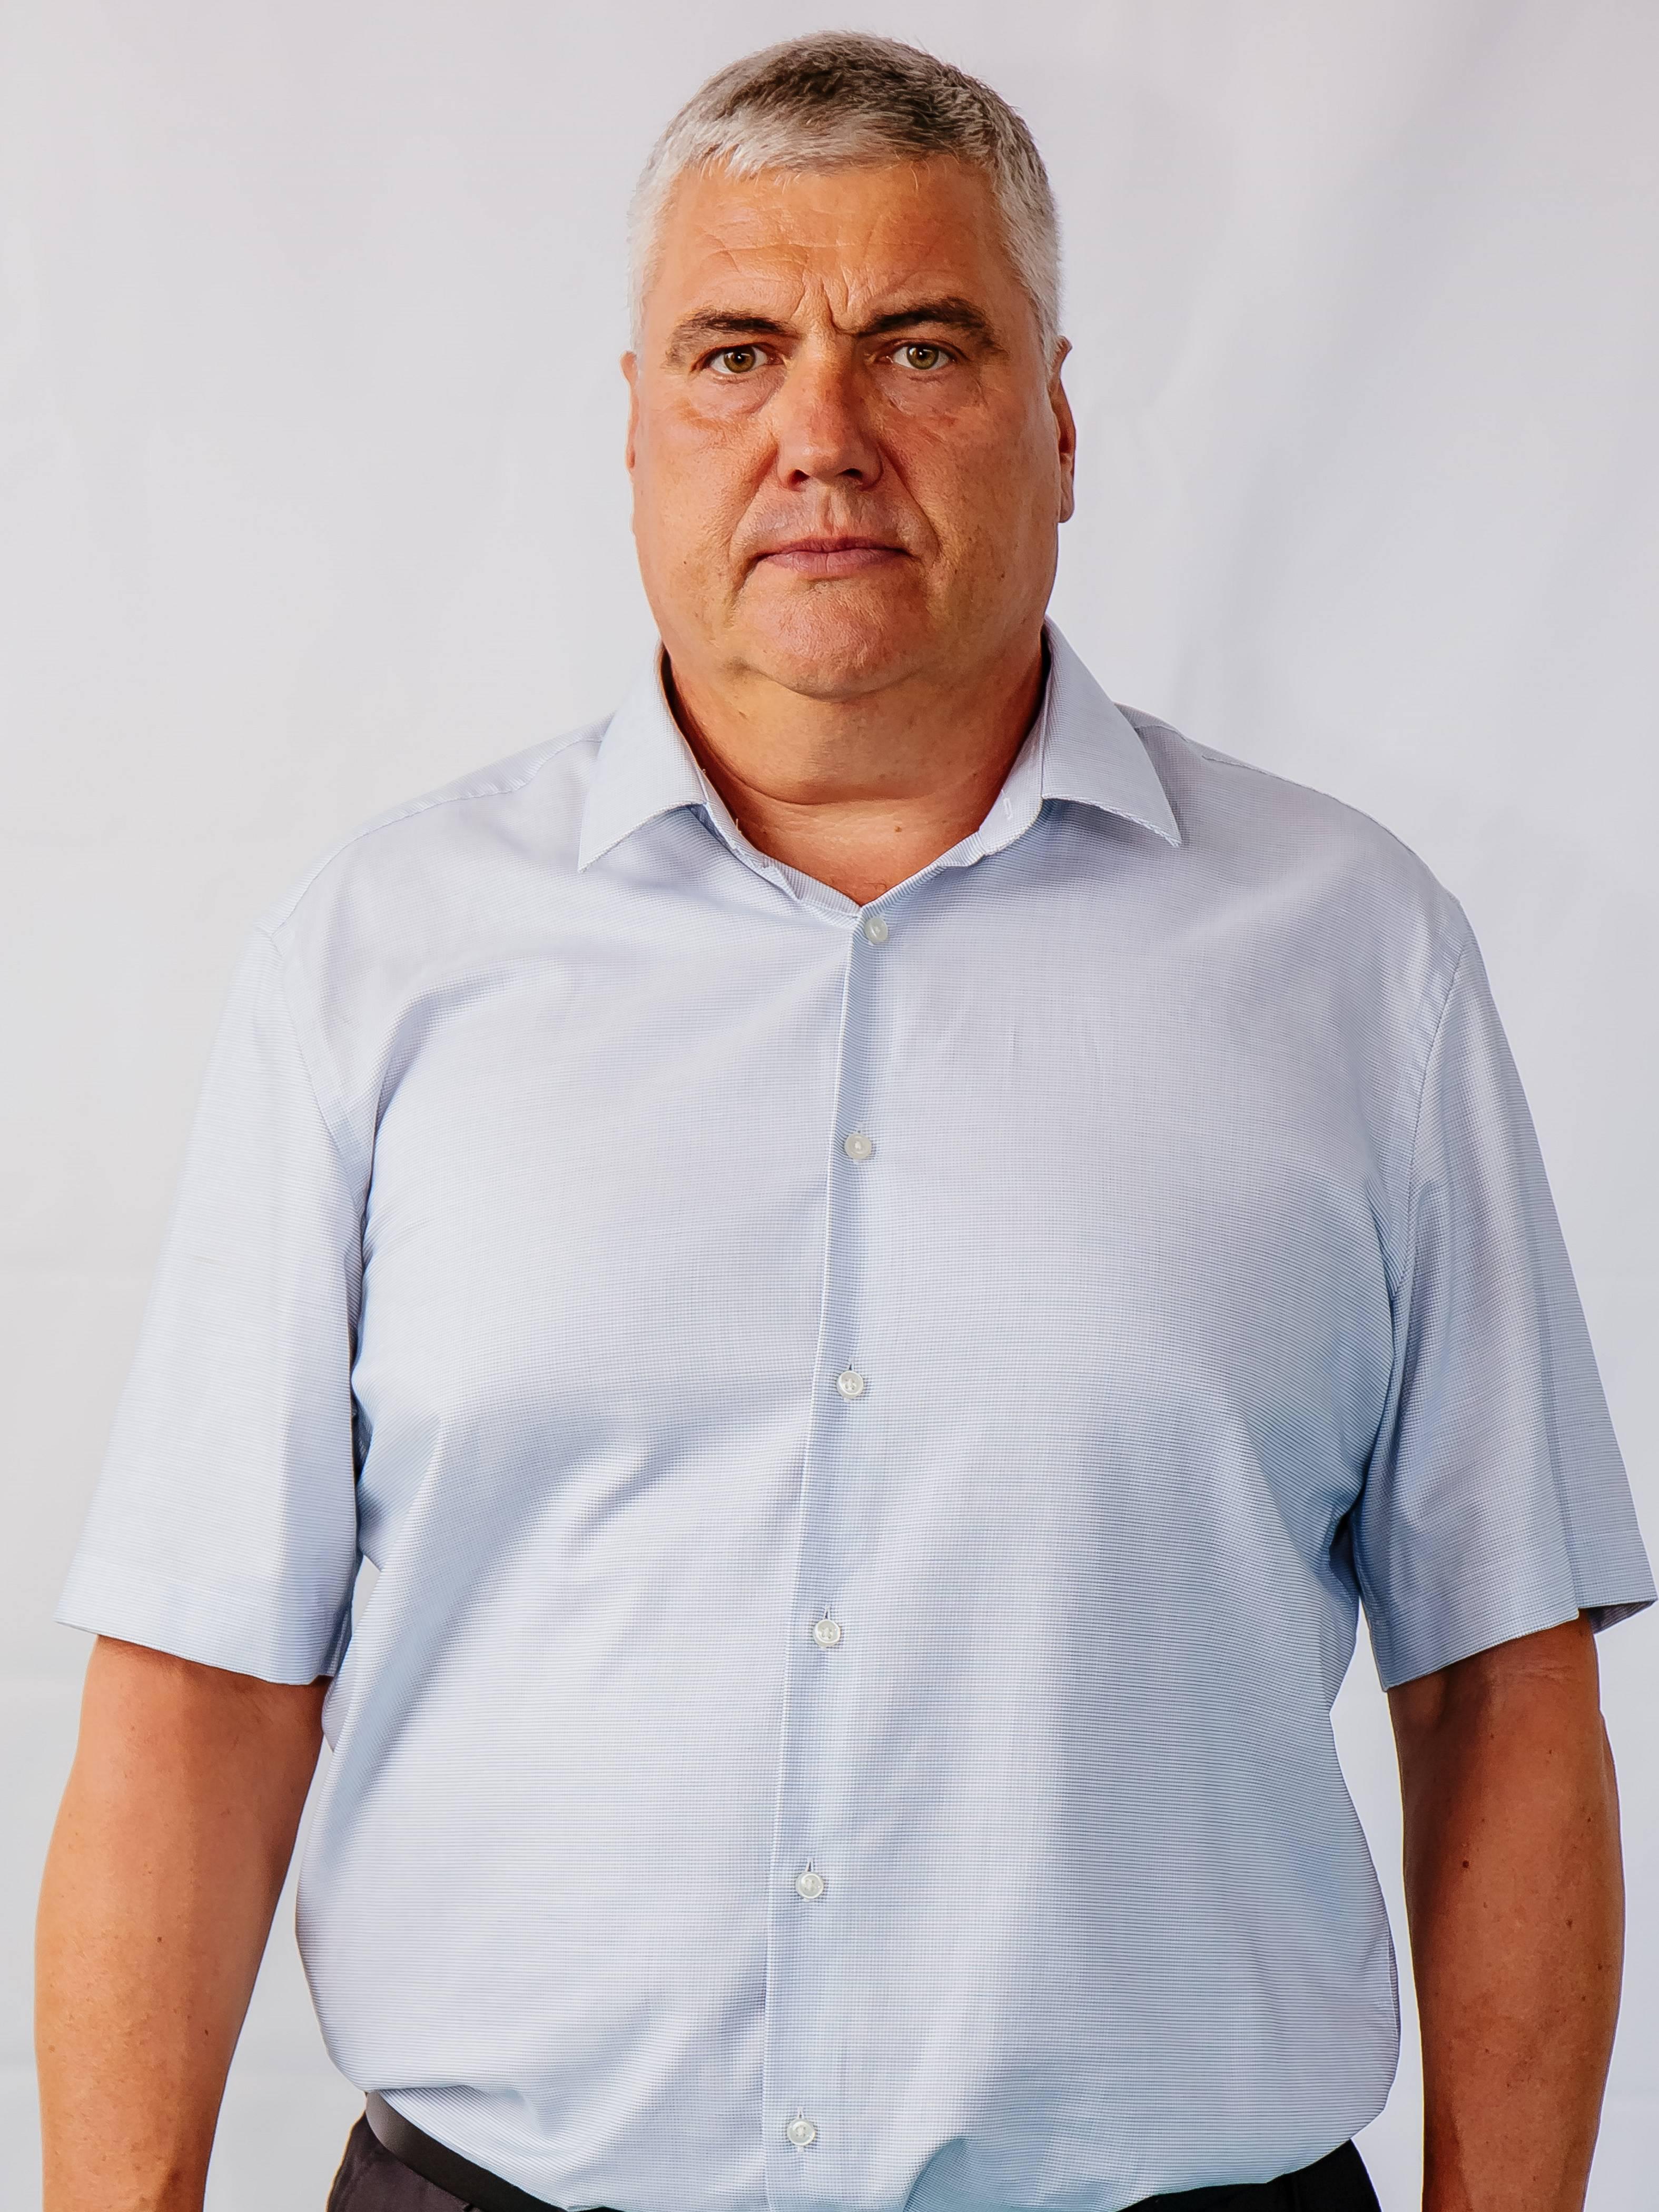 Коротов Алексей Алексеевич